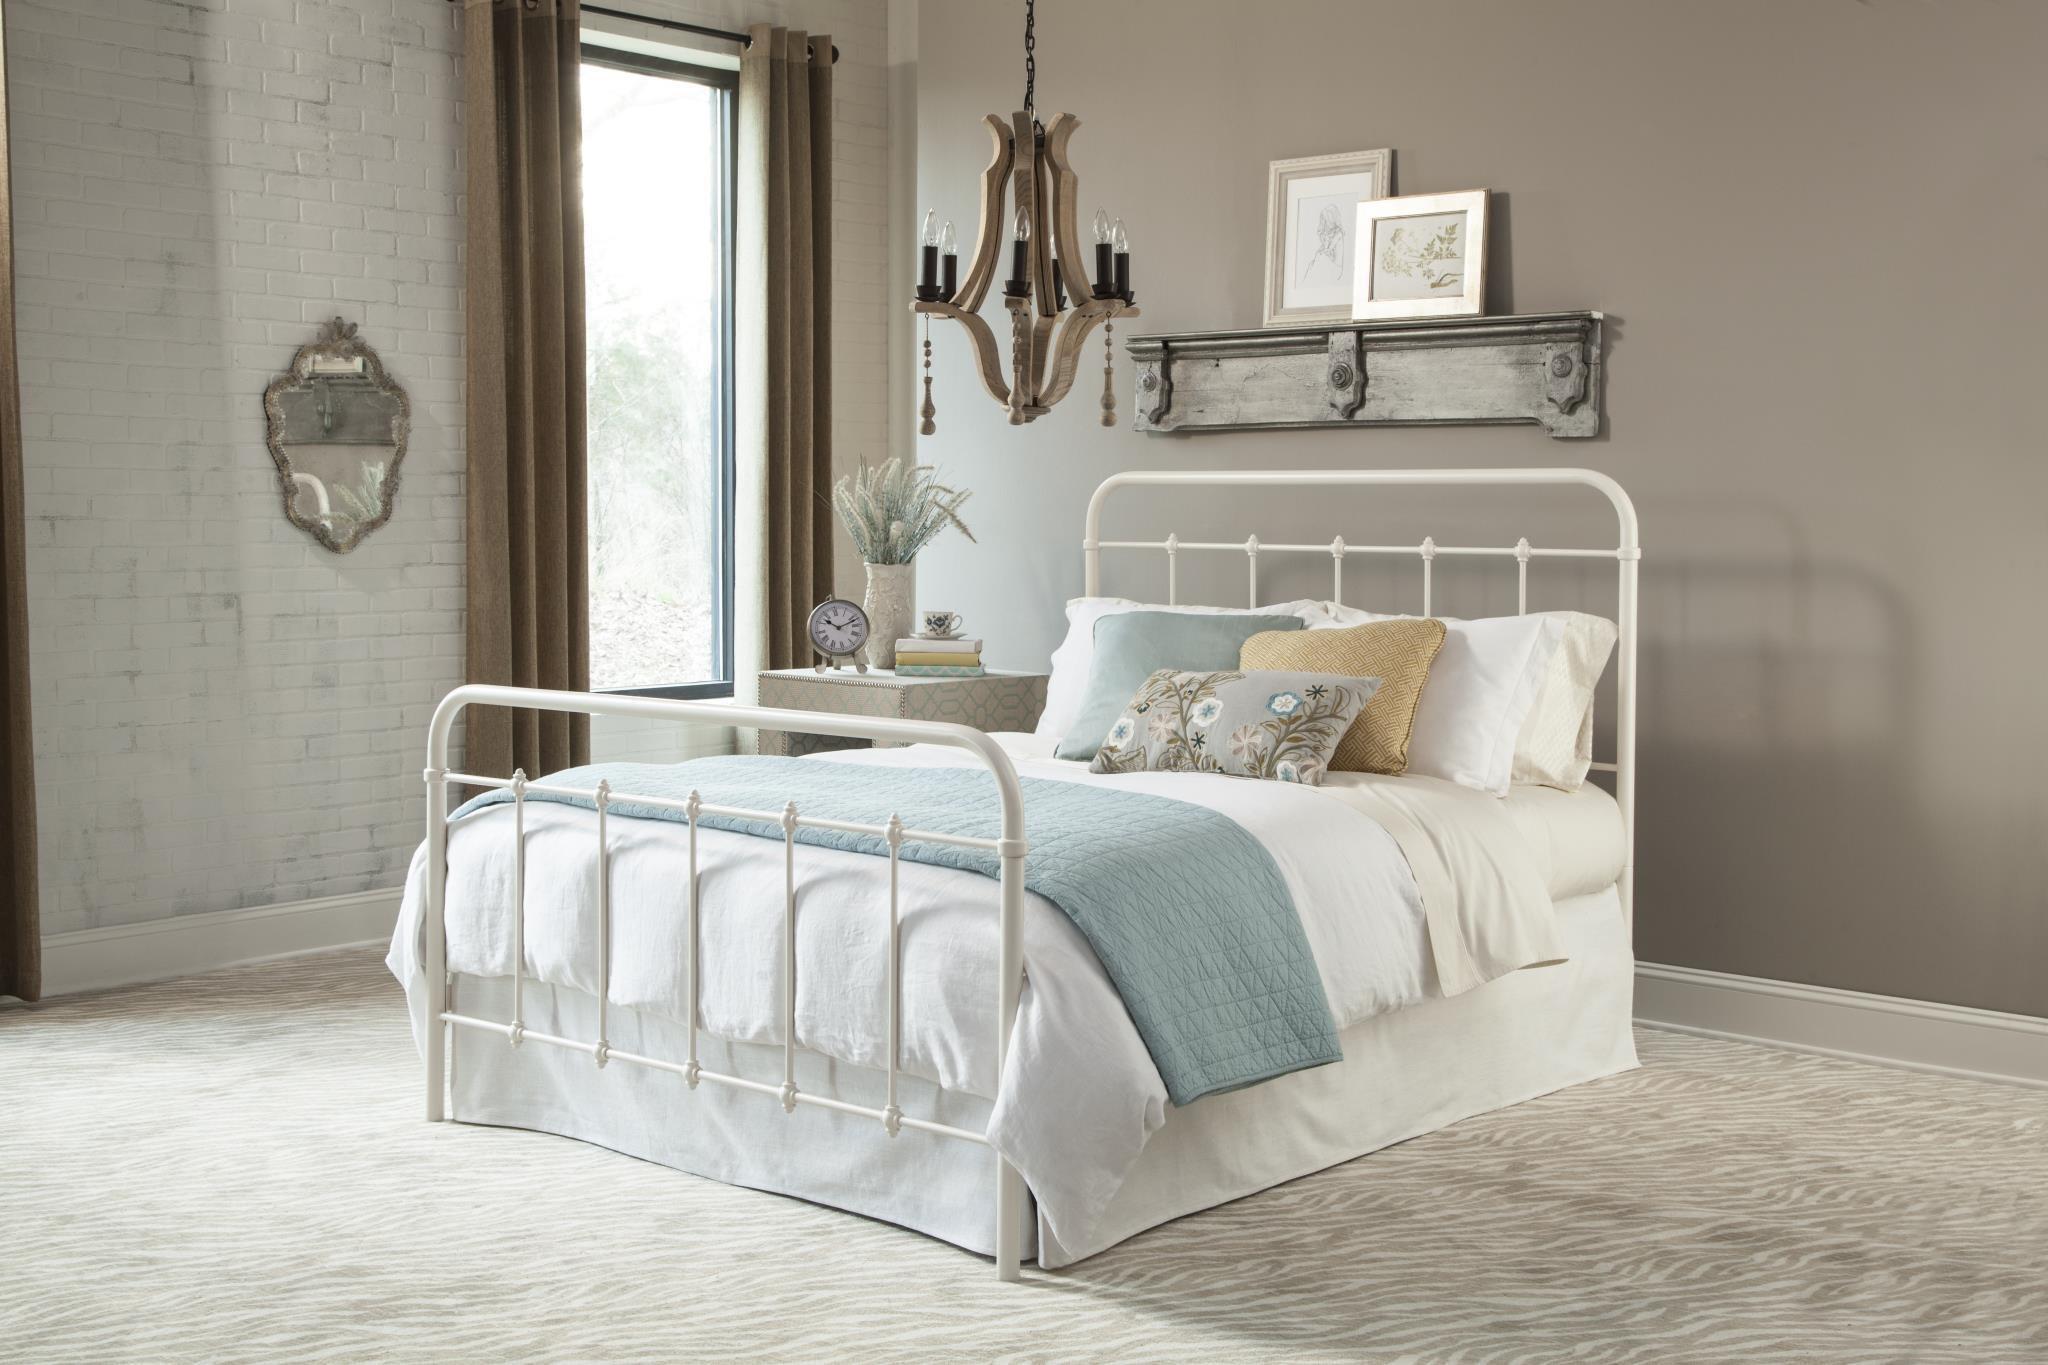 899 King Metal Bed by Kith Furniture at Furniture Fair - North Carolina